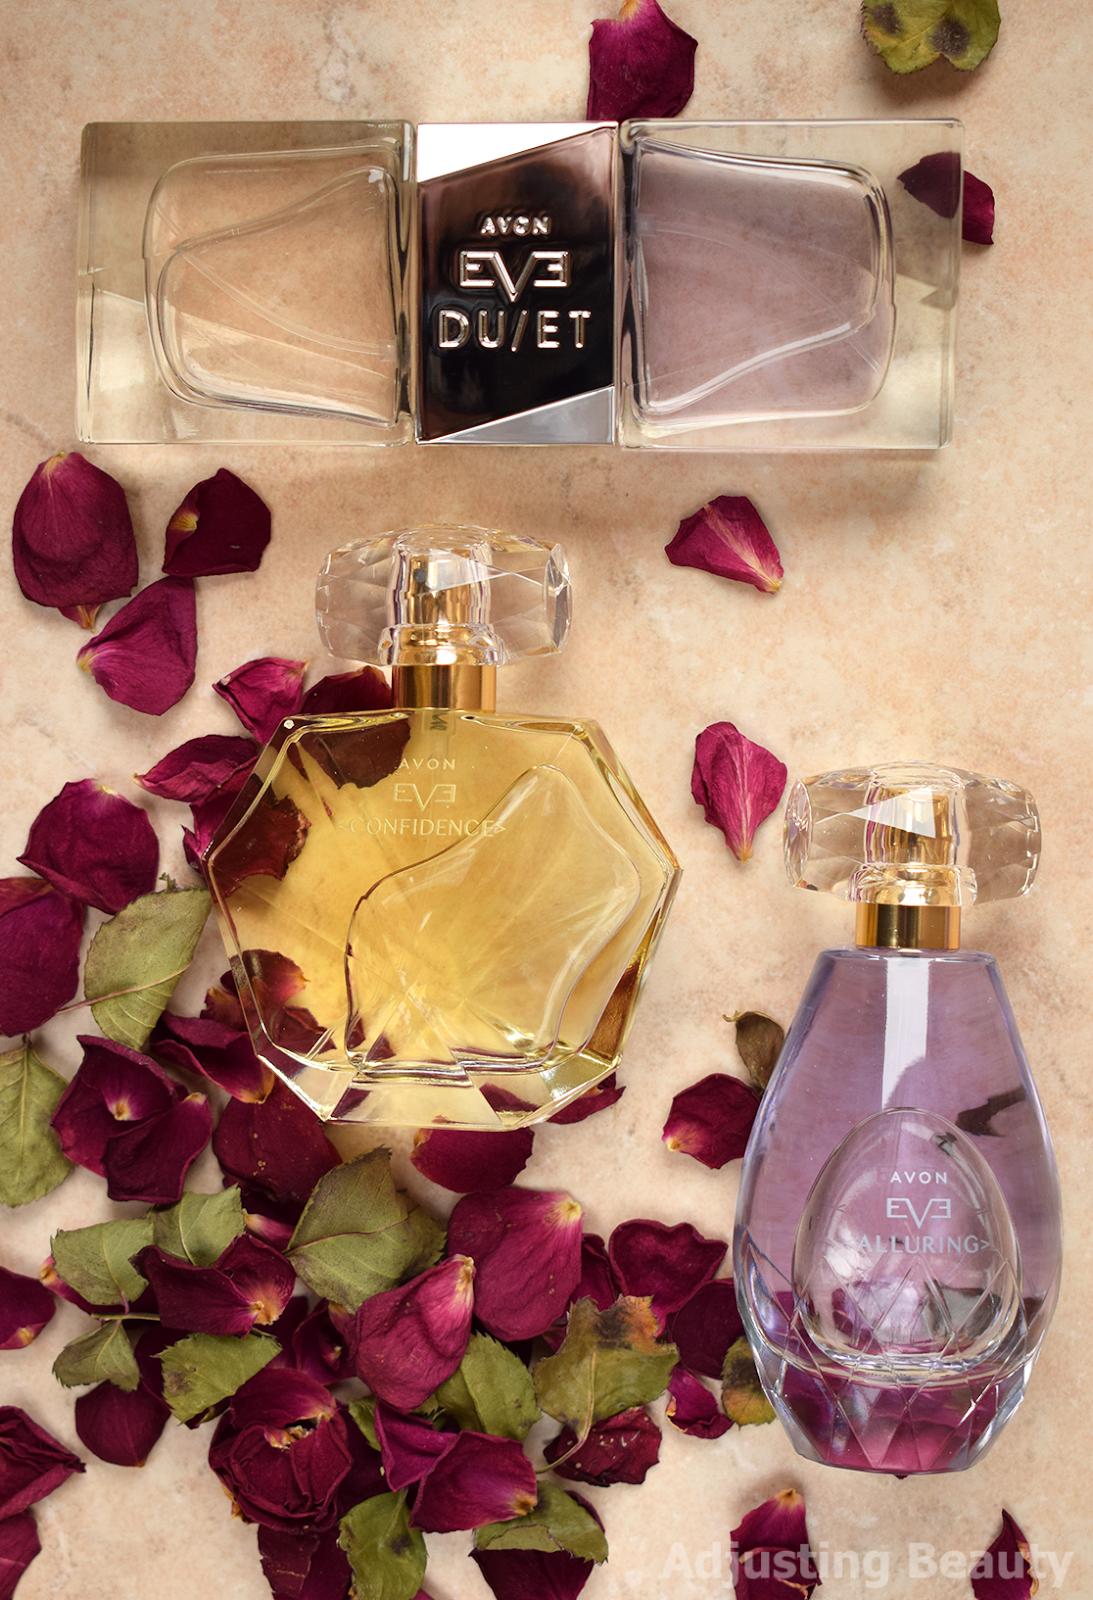 Eva avon perfume incandessence avon